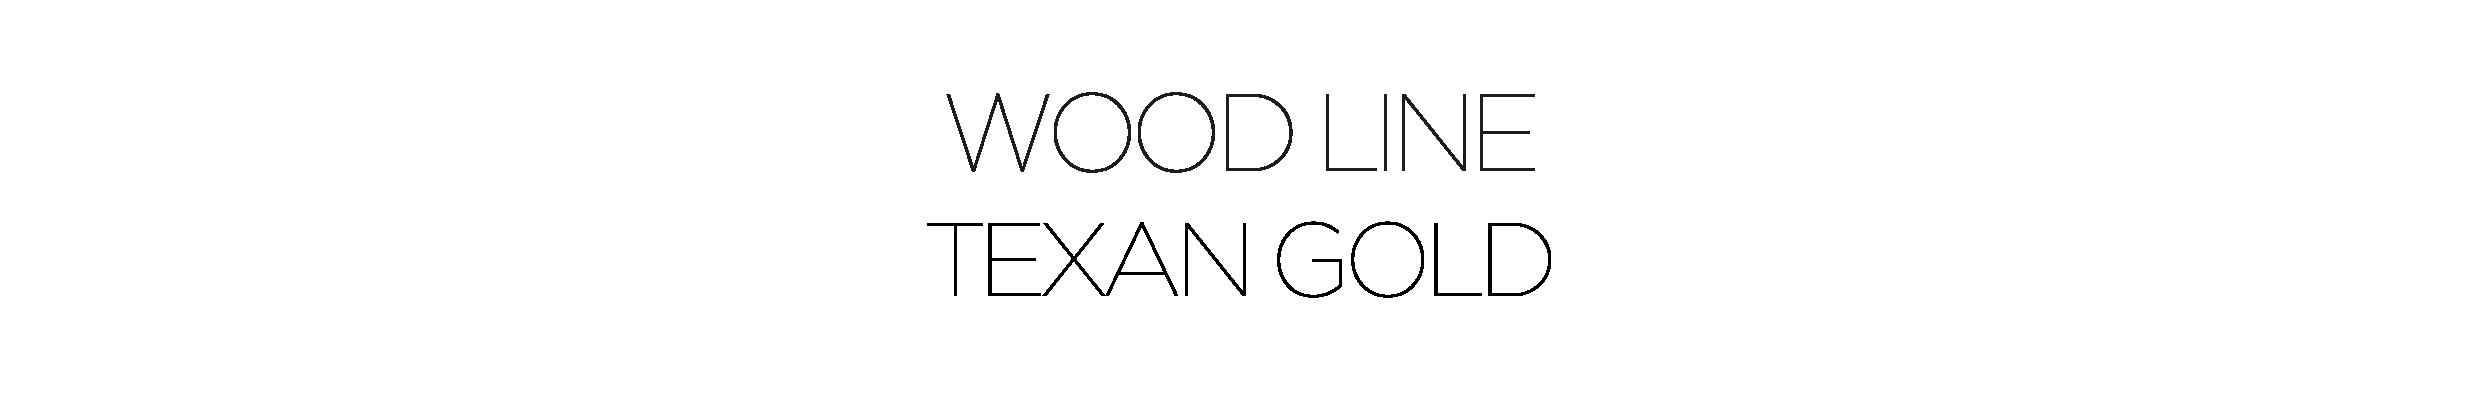 WOOD LINE TEXAN GOLD-11